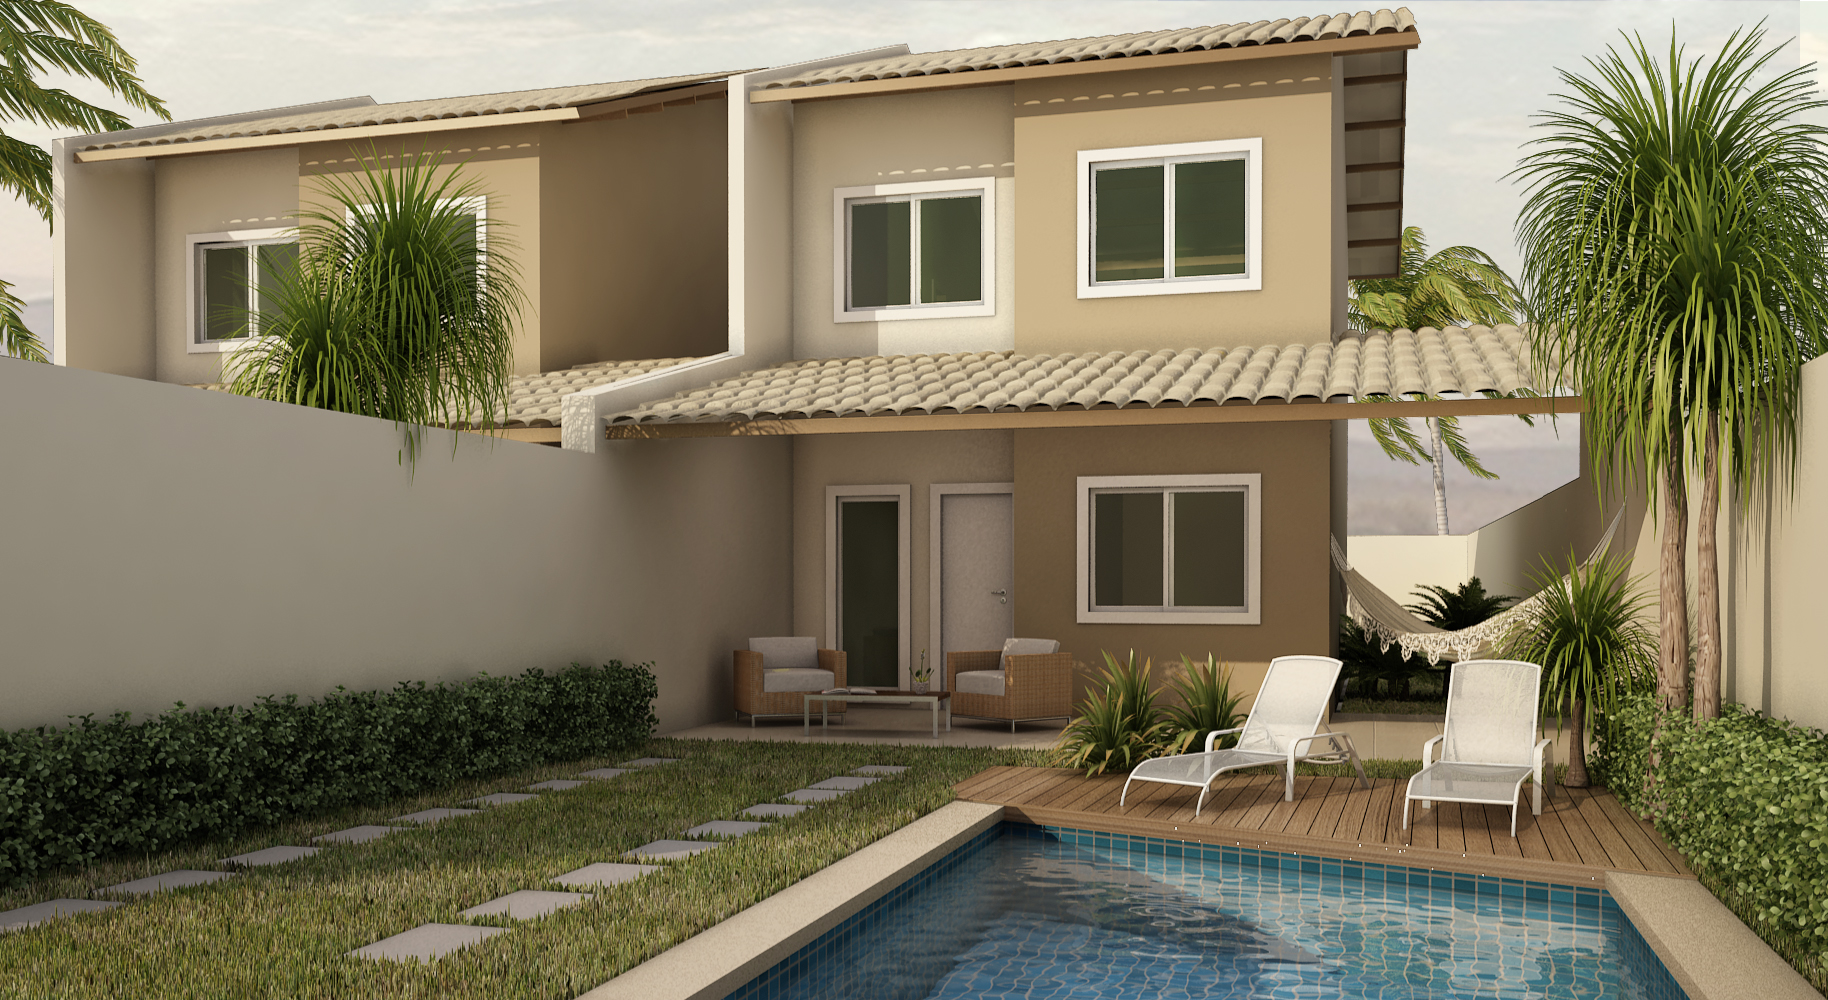 Fotos de fachadas de casas duplex decorando casas for Imagenes de casas